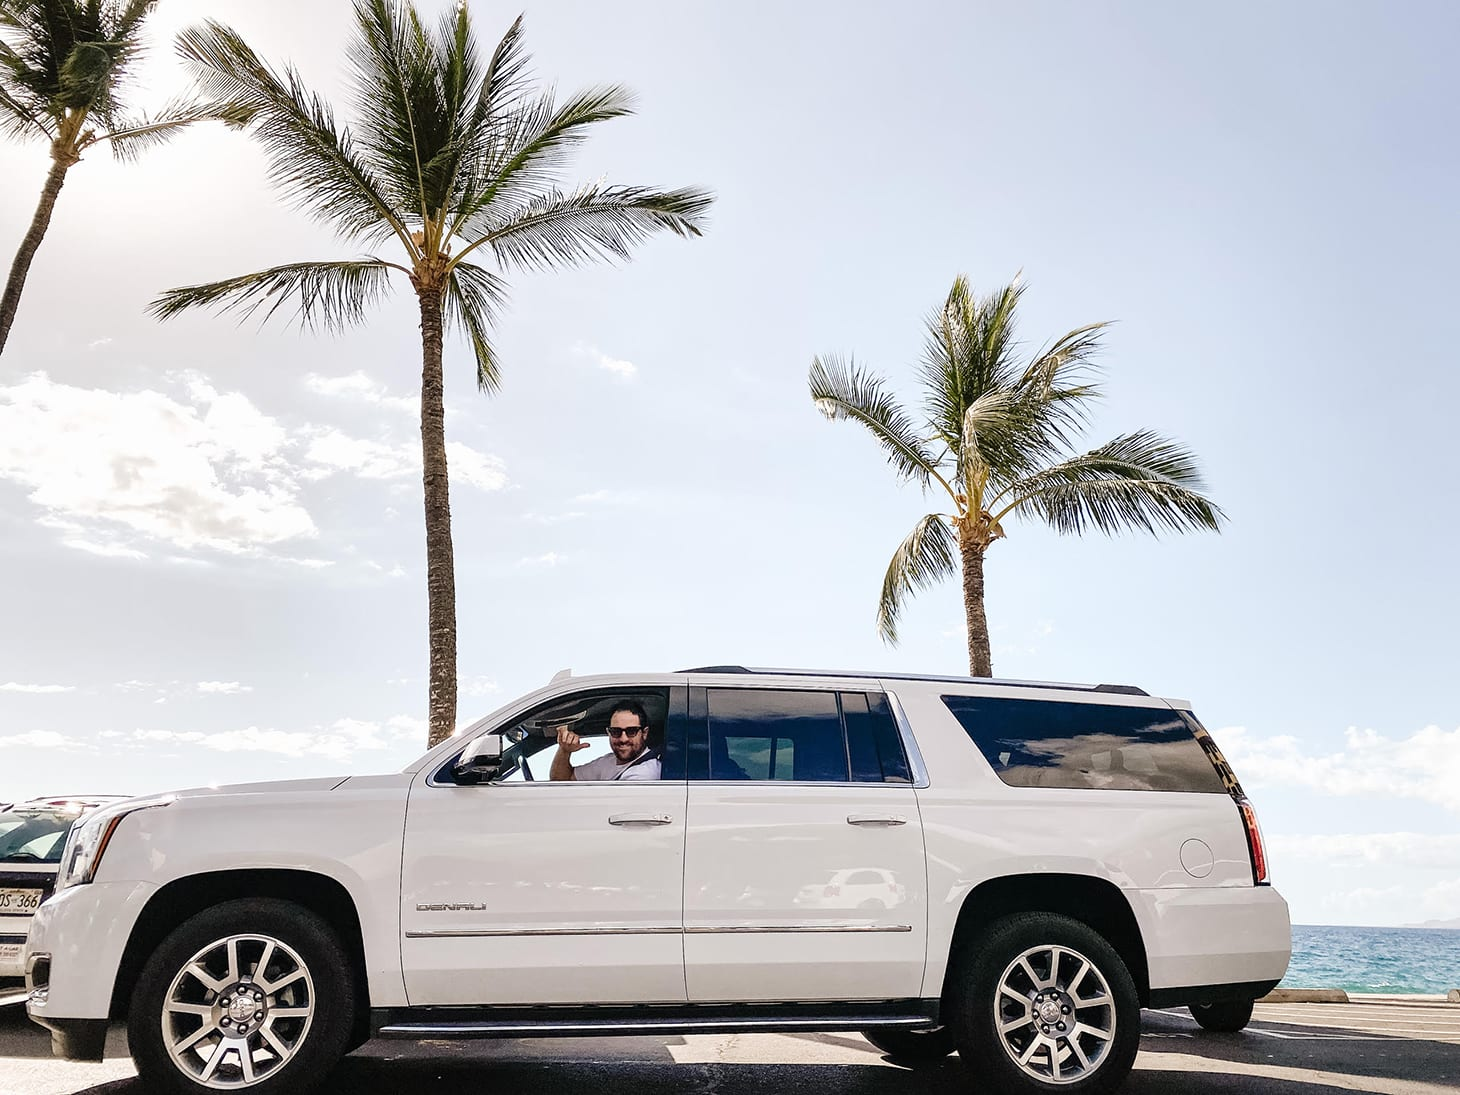 Discount Car Rental Hawaii GMC Denali